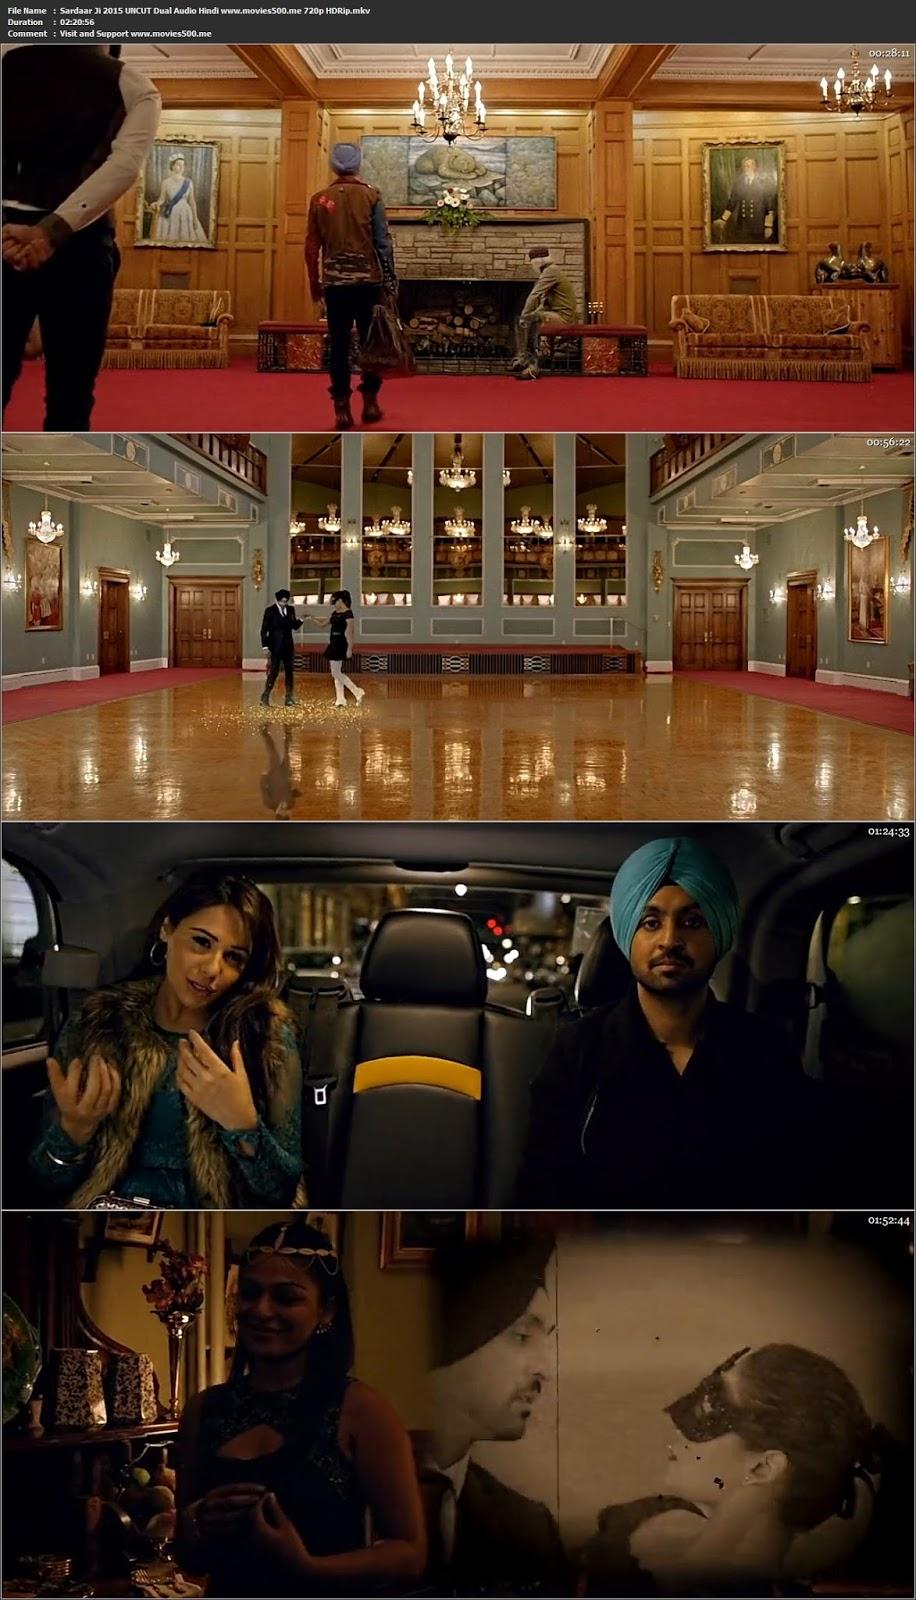 Sardaar Ji 2015 UNCUT Punjabi Movie HDRip 720p 1.4GB at bcvwop.biz